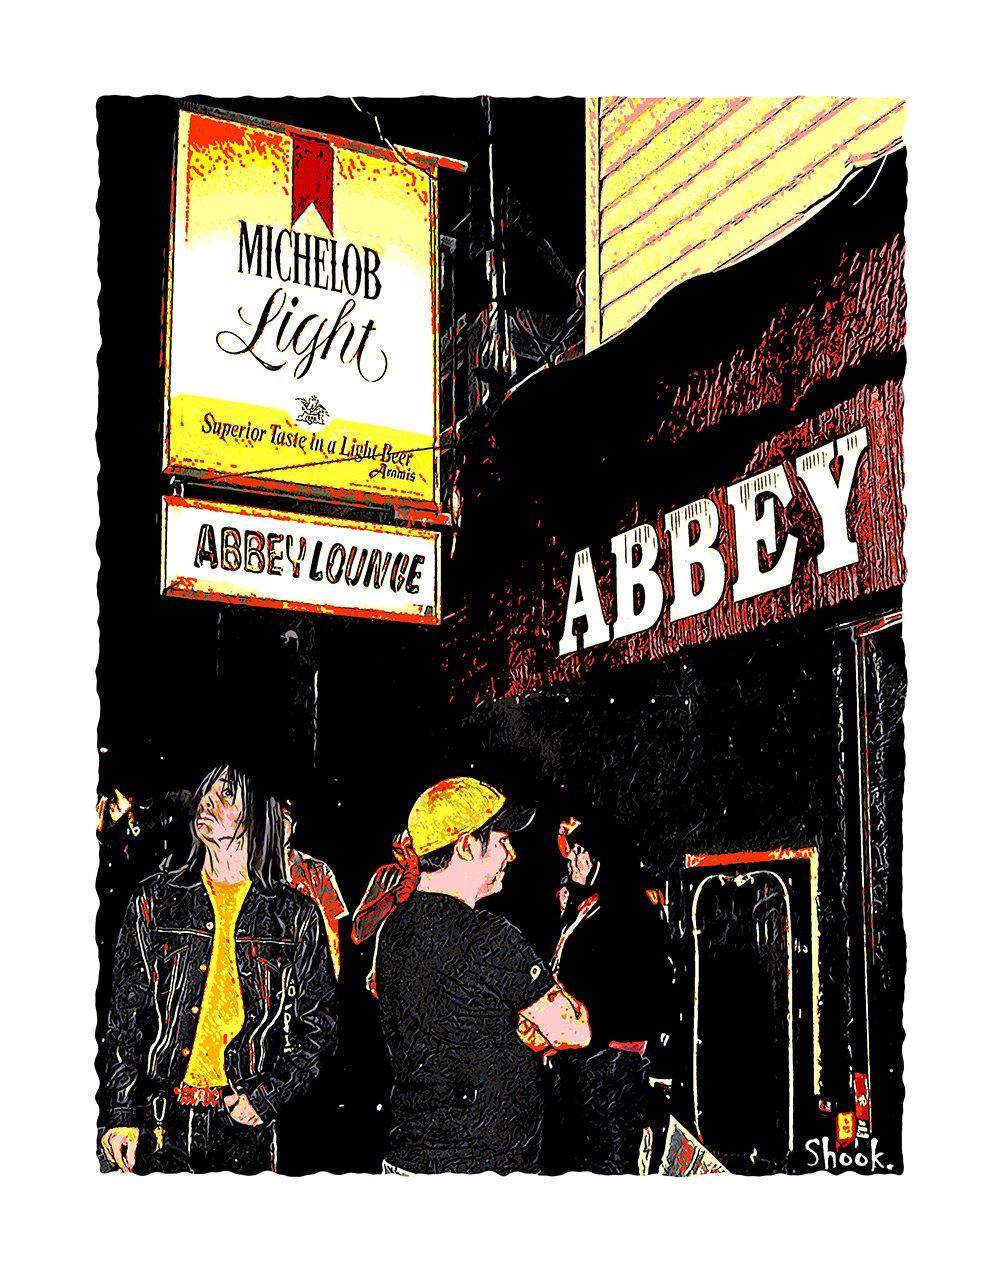 Abbey Lounge, Cambridge MA Giclée Art Print (Multi-size options)